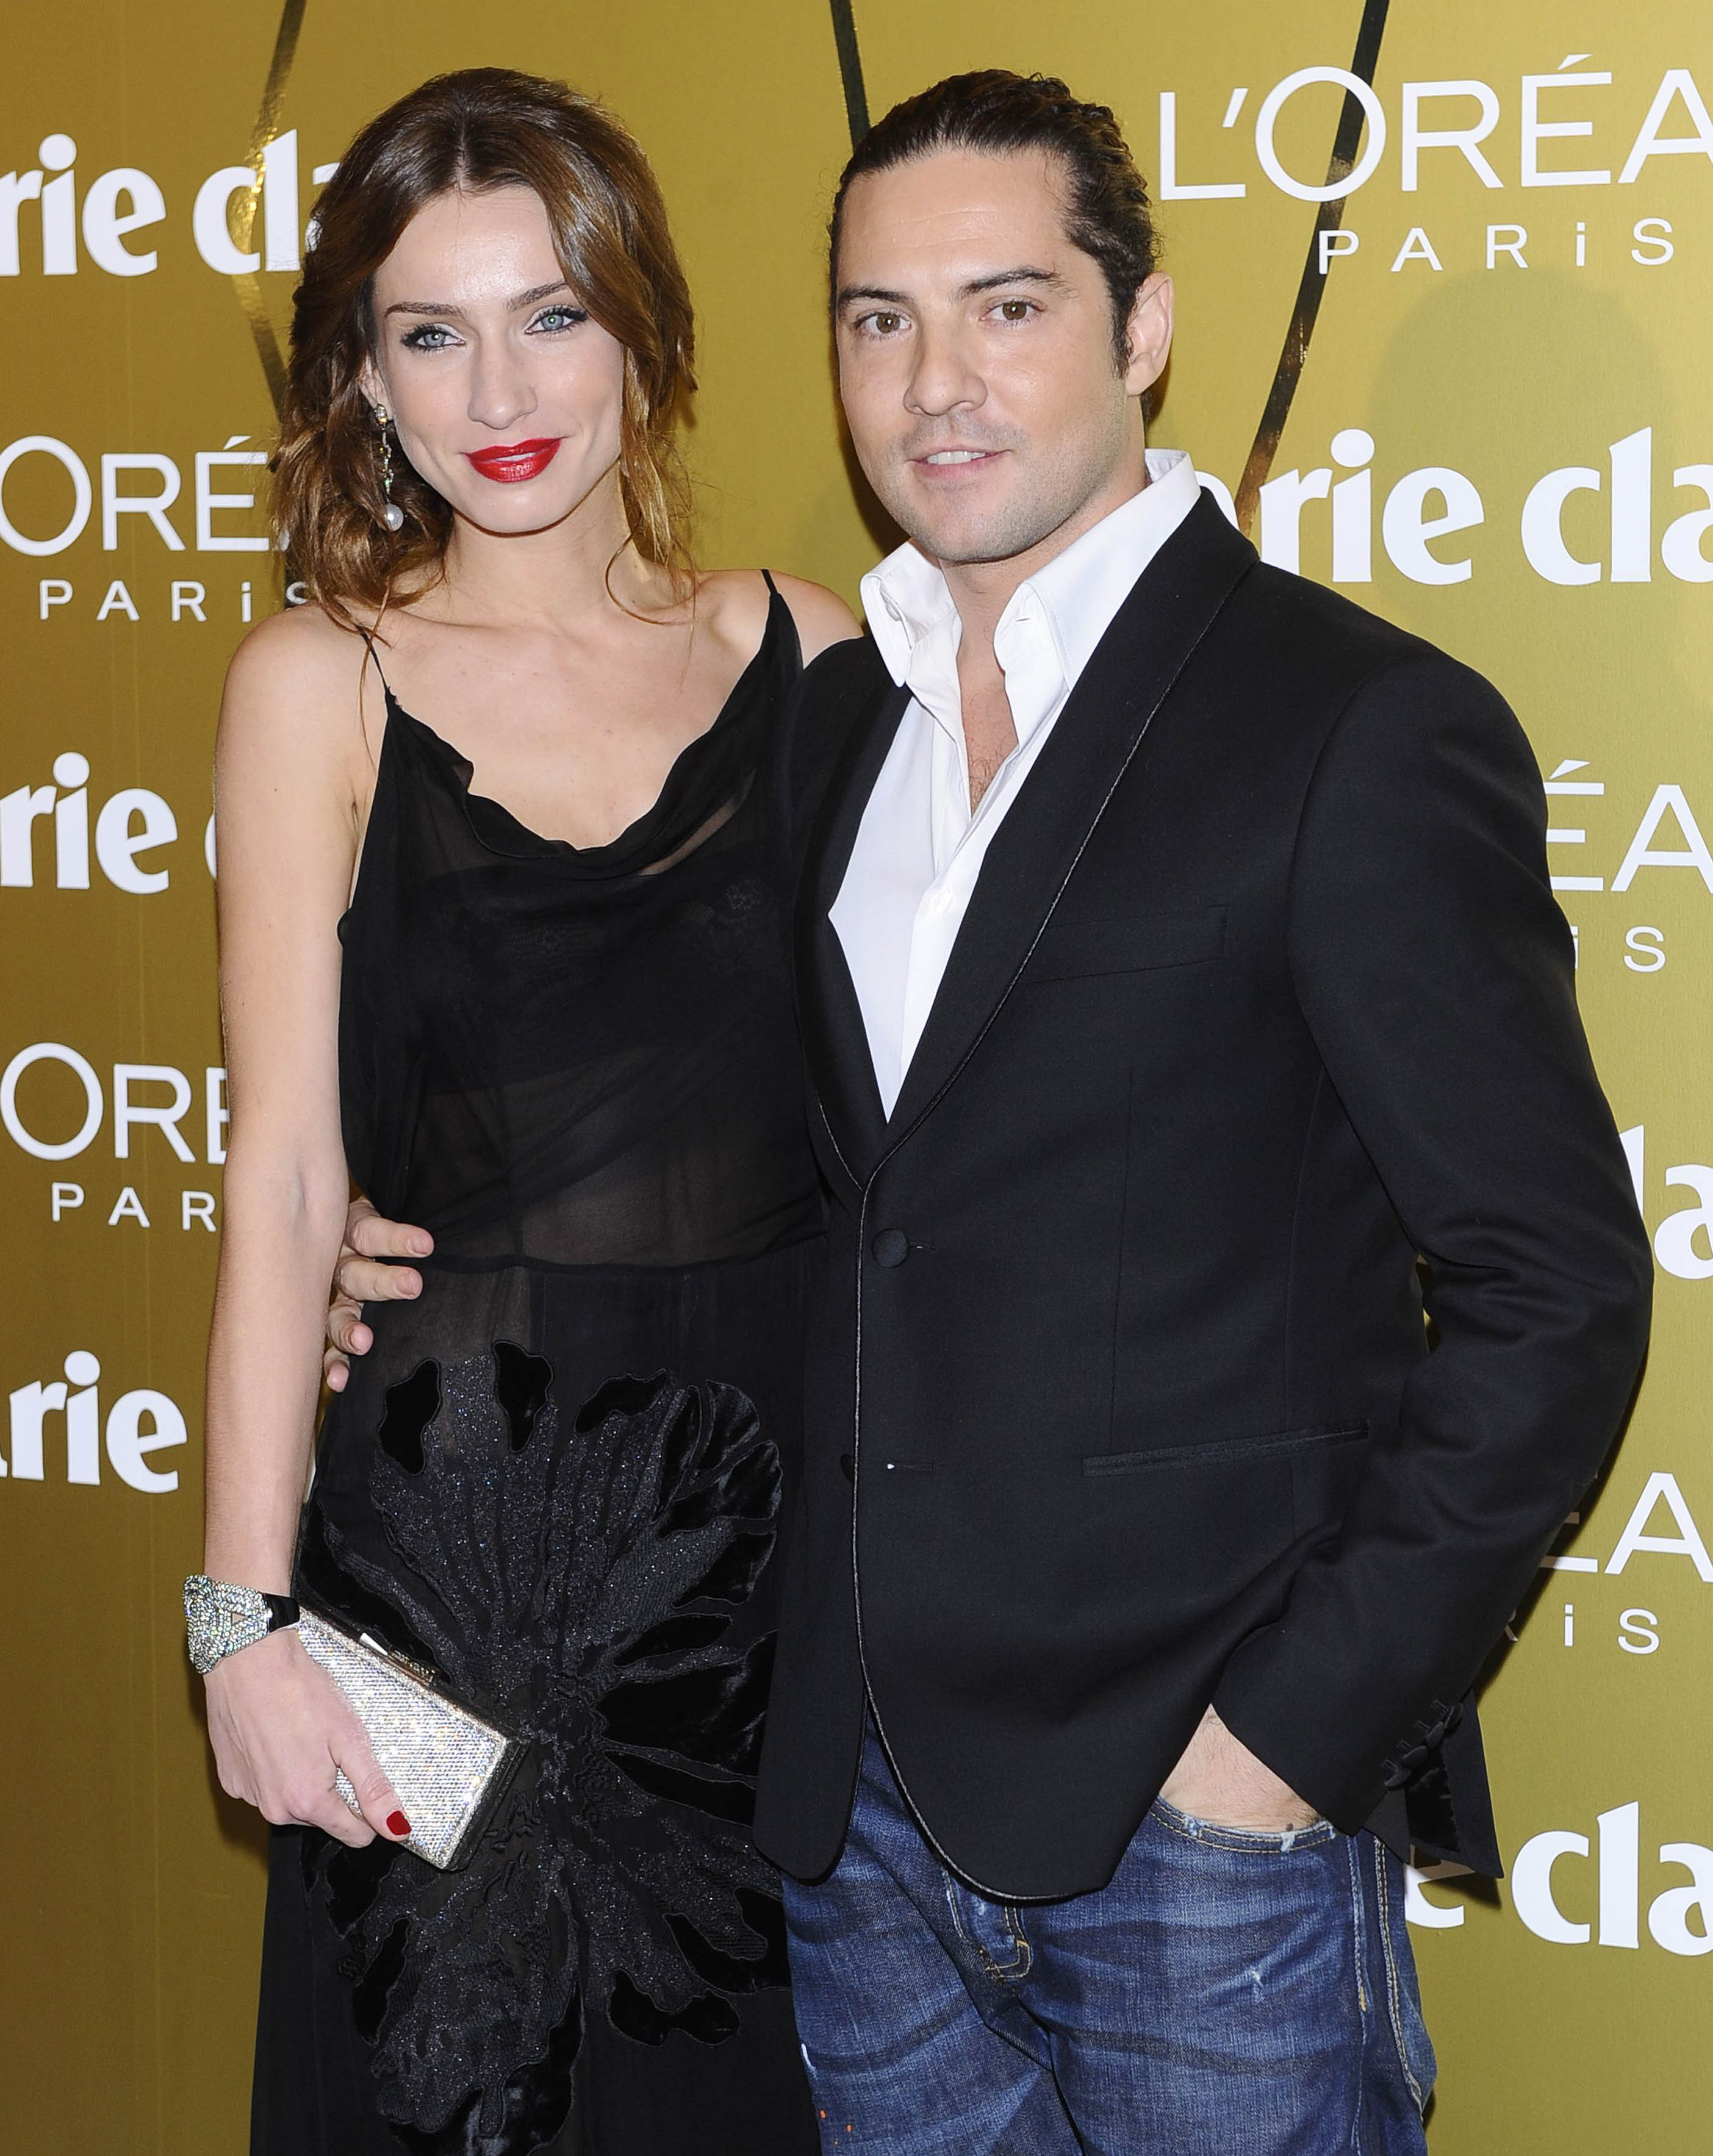 David Bisbal confirma que ha vuelto con la modelo Raquel Jiménez